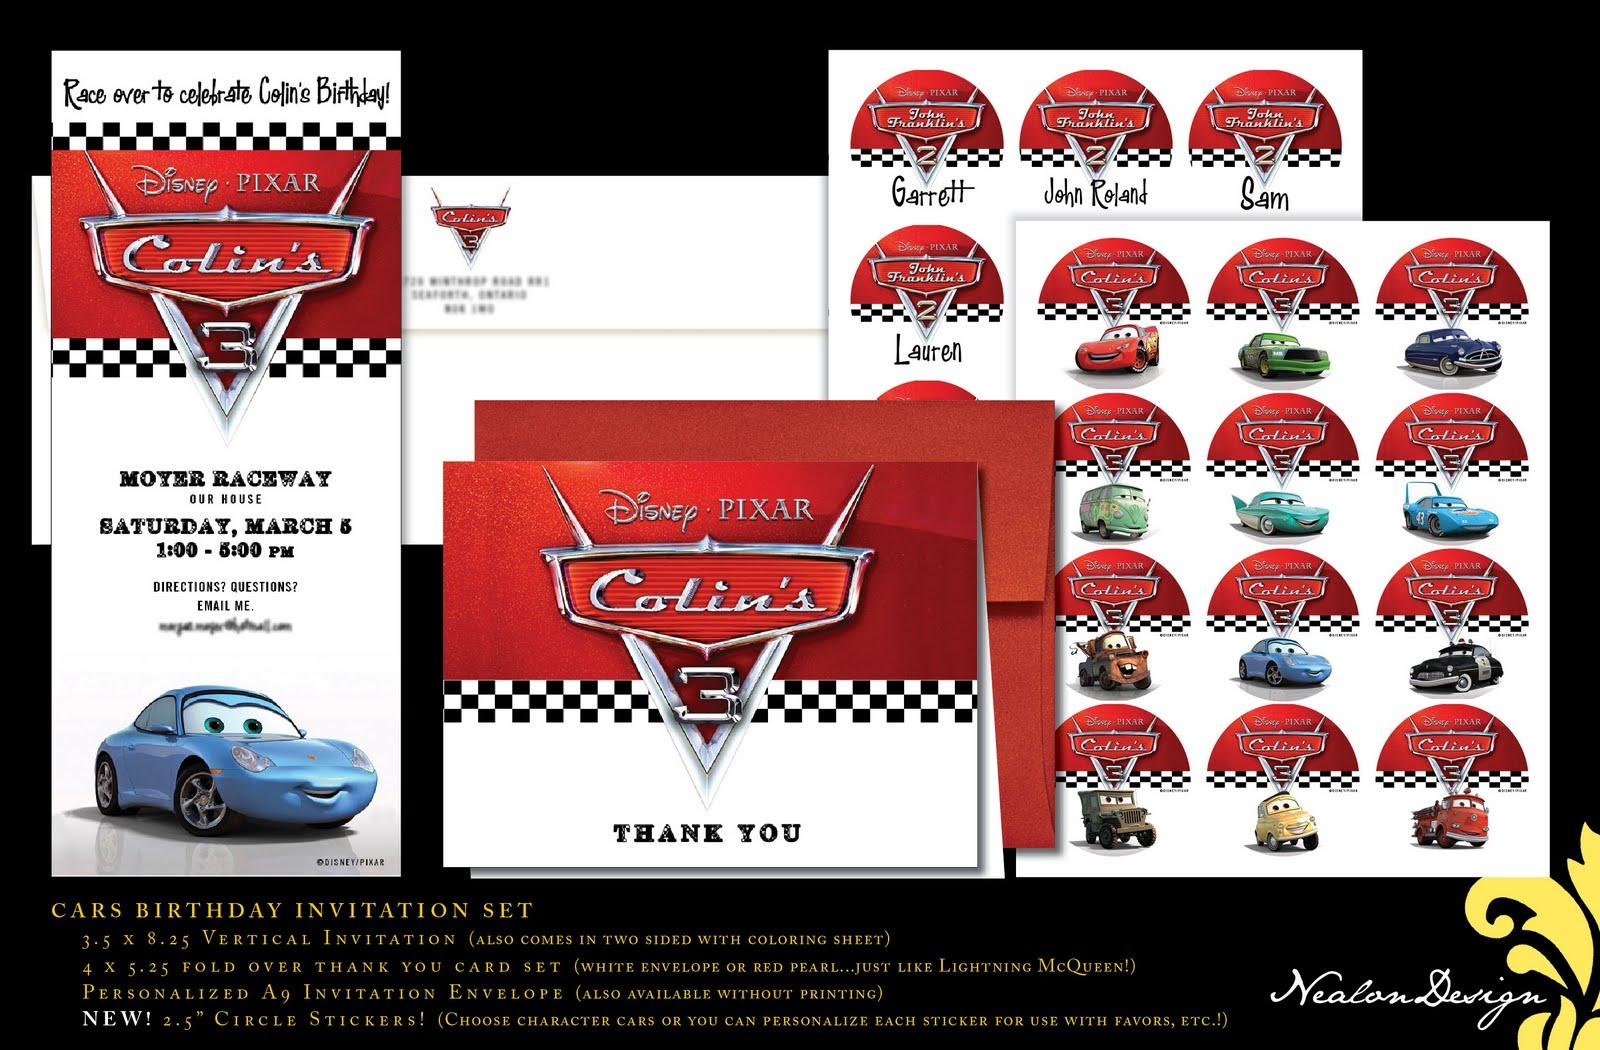 Cars 2 Invitations Personalized